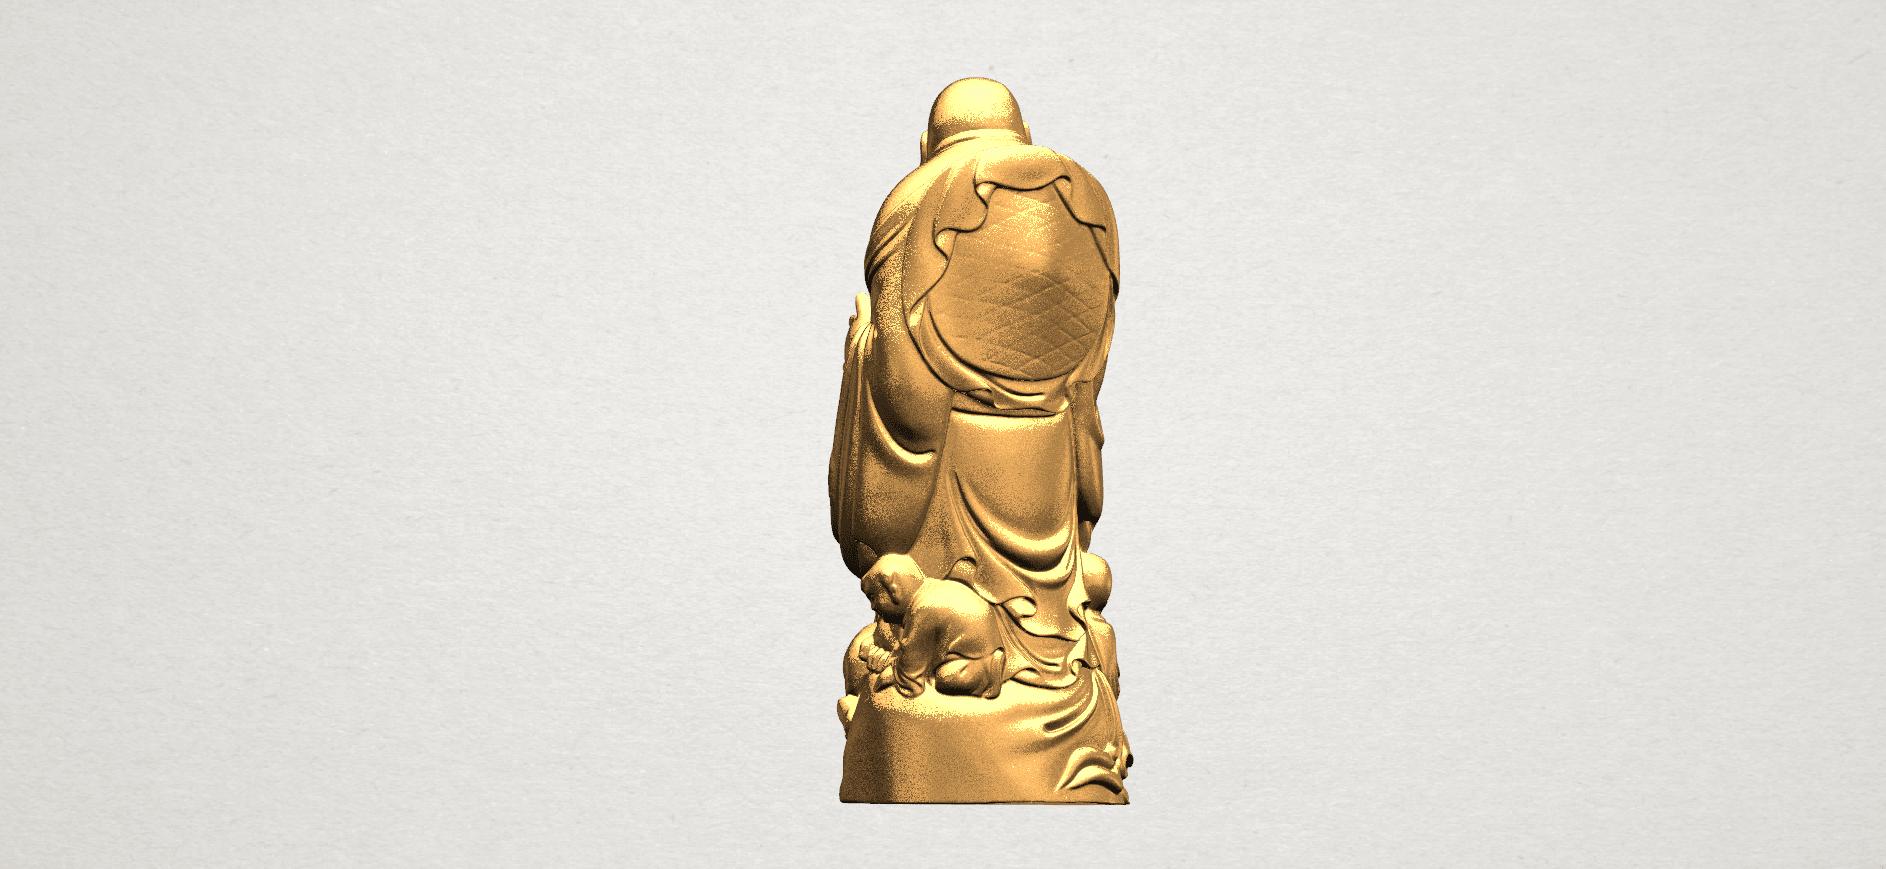 TDA0070 Metteyya Buddha 03 - 88mm - A05.png Download free STL file Metteyya Buddha 03 • 3D printing object, GeorgesNikkei